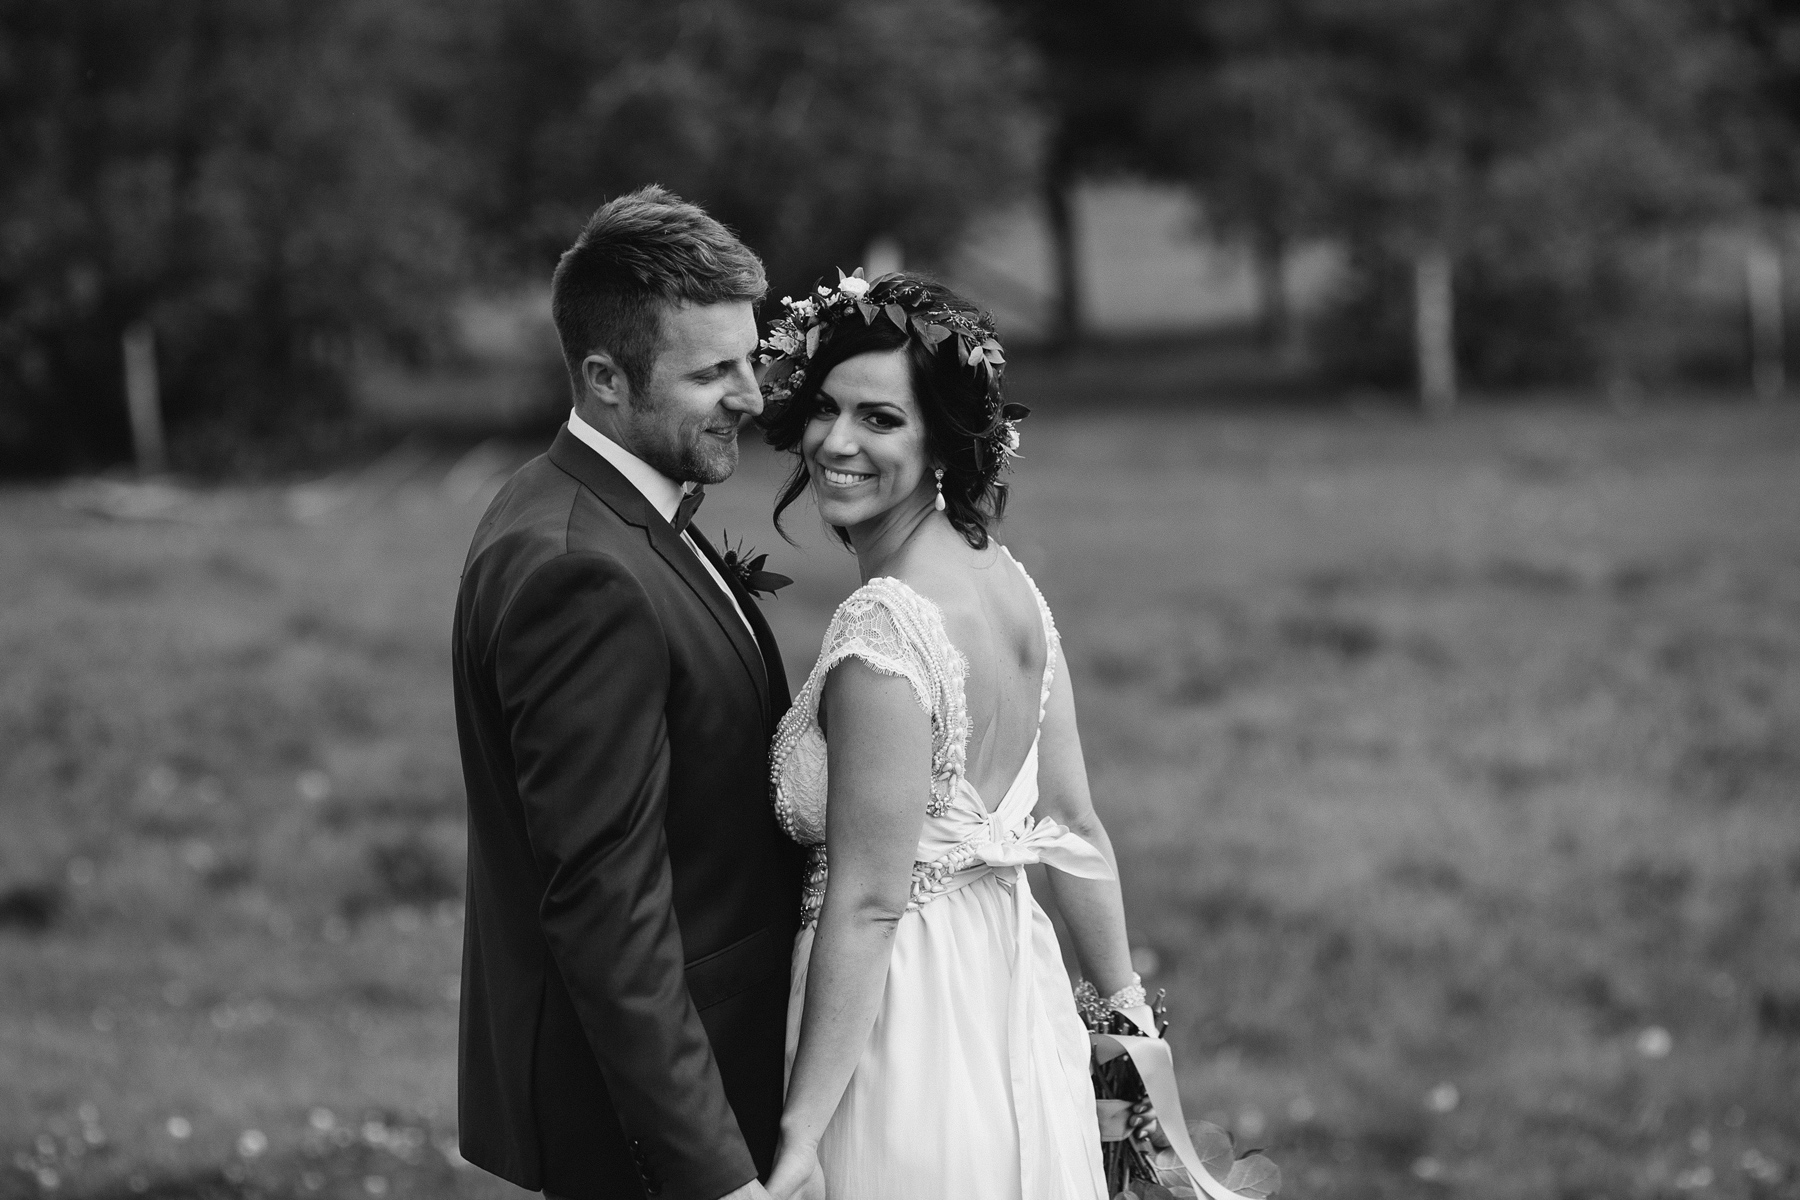 alberta-farm-wedding-photographer-rp-wj-080.jpg